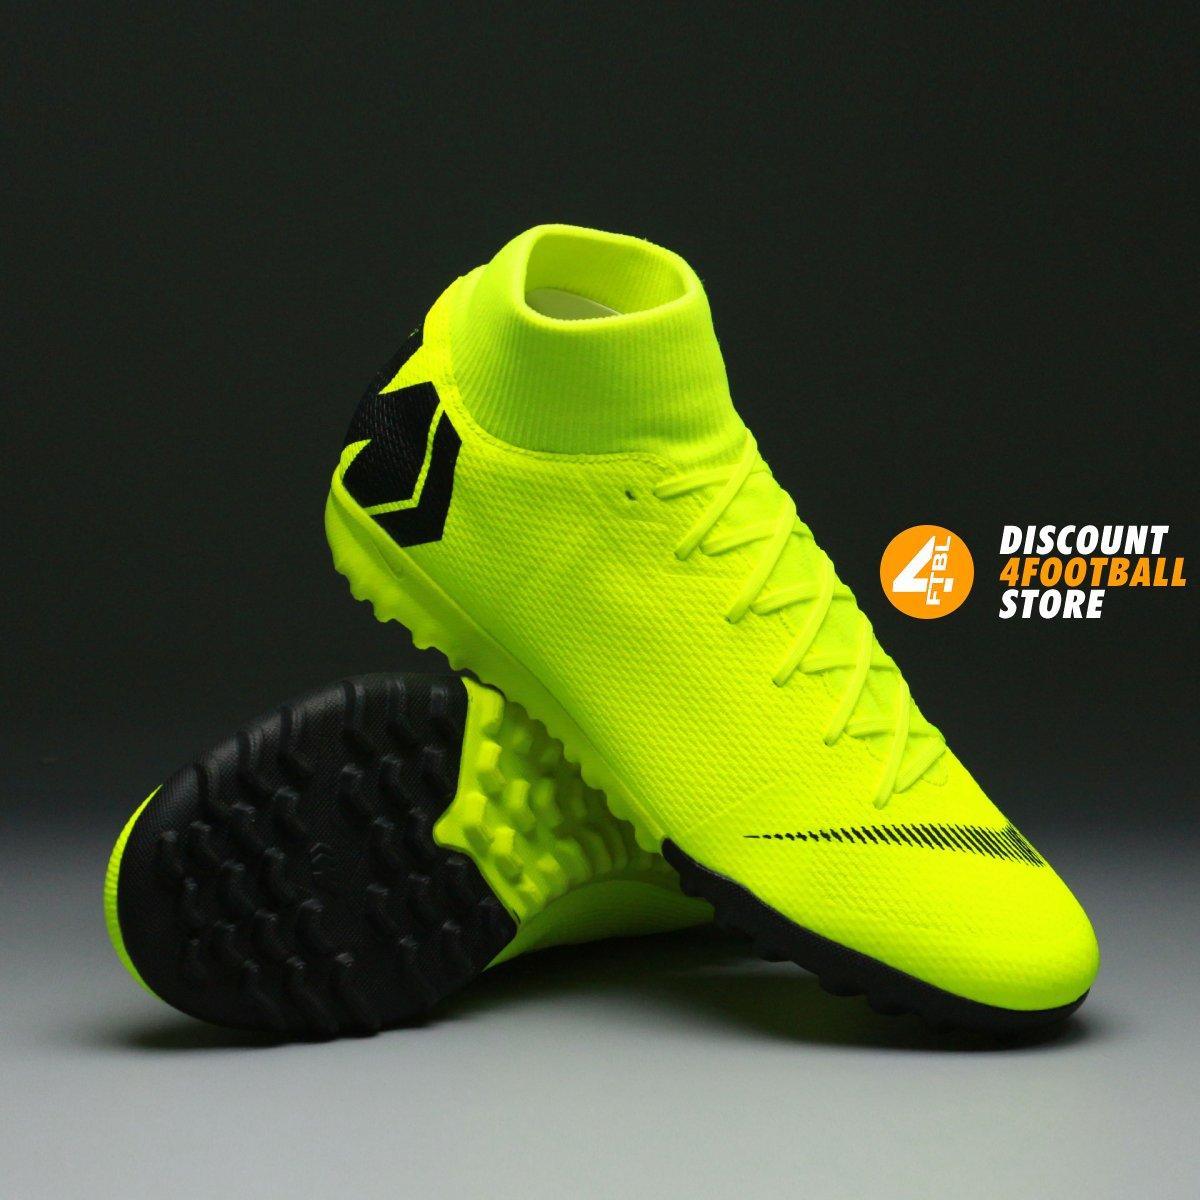 d65ee1c799a5be Сороконожки Nike Mercurial Superfly Academy AH7370-701 купить на ...